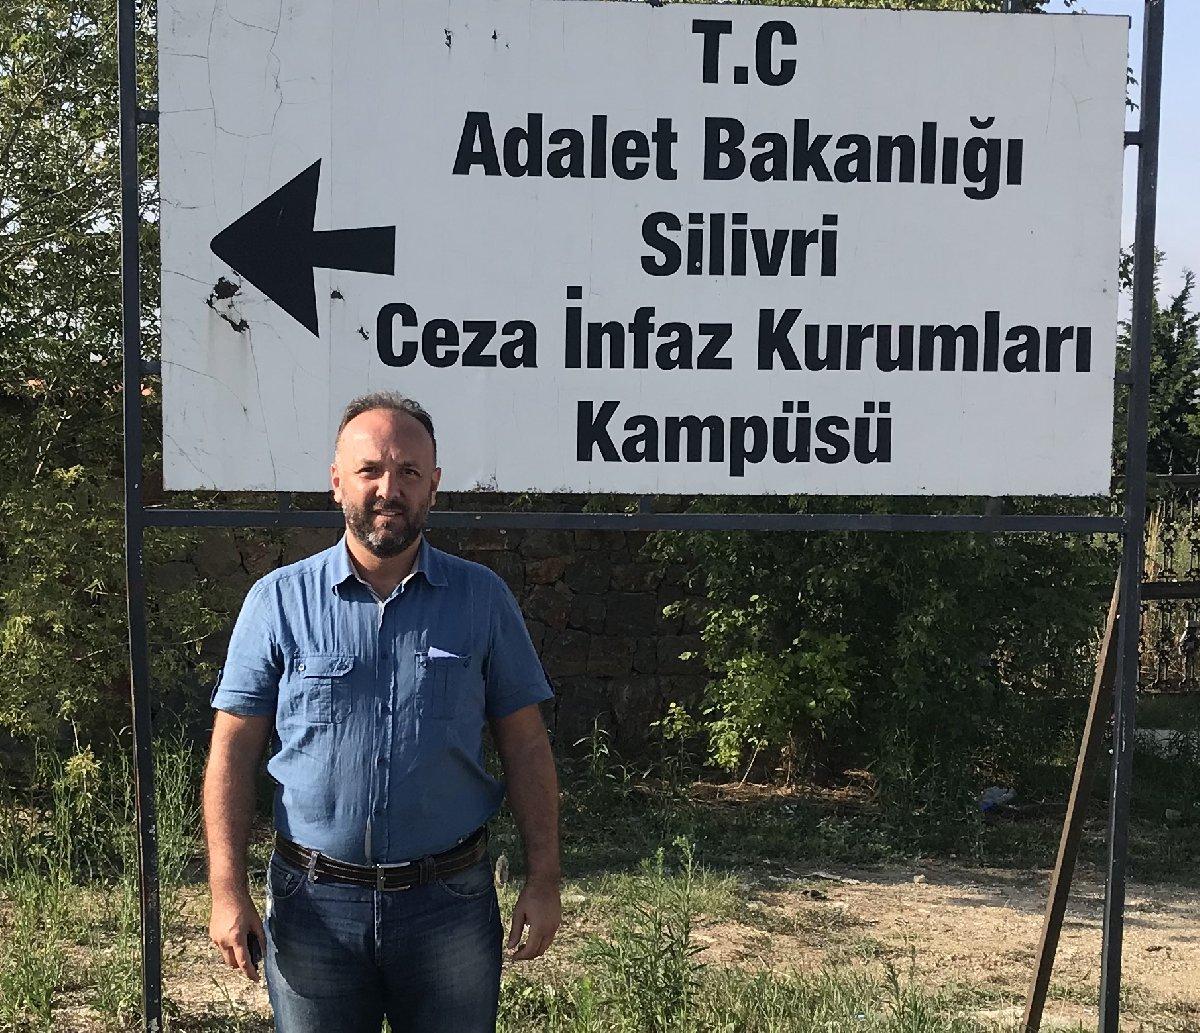 FOTO:SÖZCÜ - CHP'li Turan Akçagöz, Eren Erdem'i cezaevinde ziyaret etti.